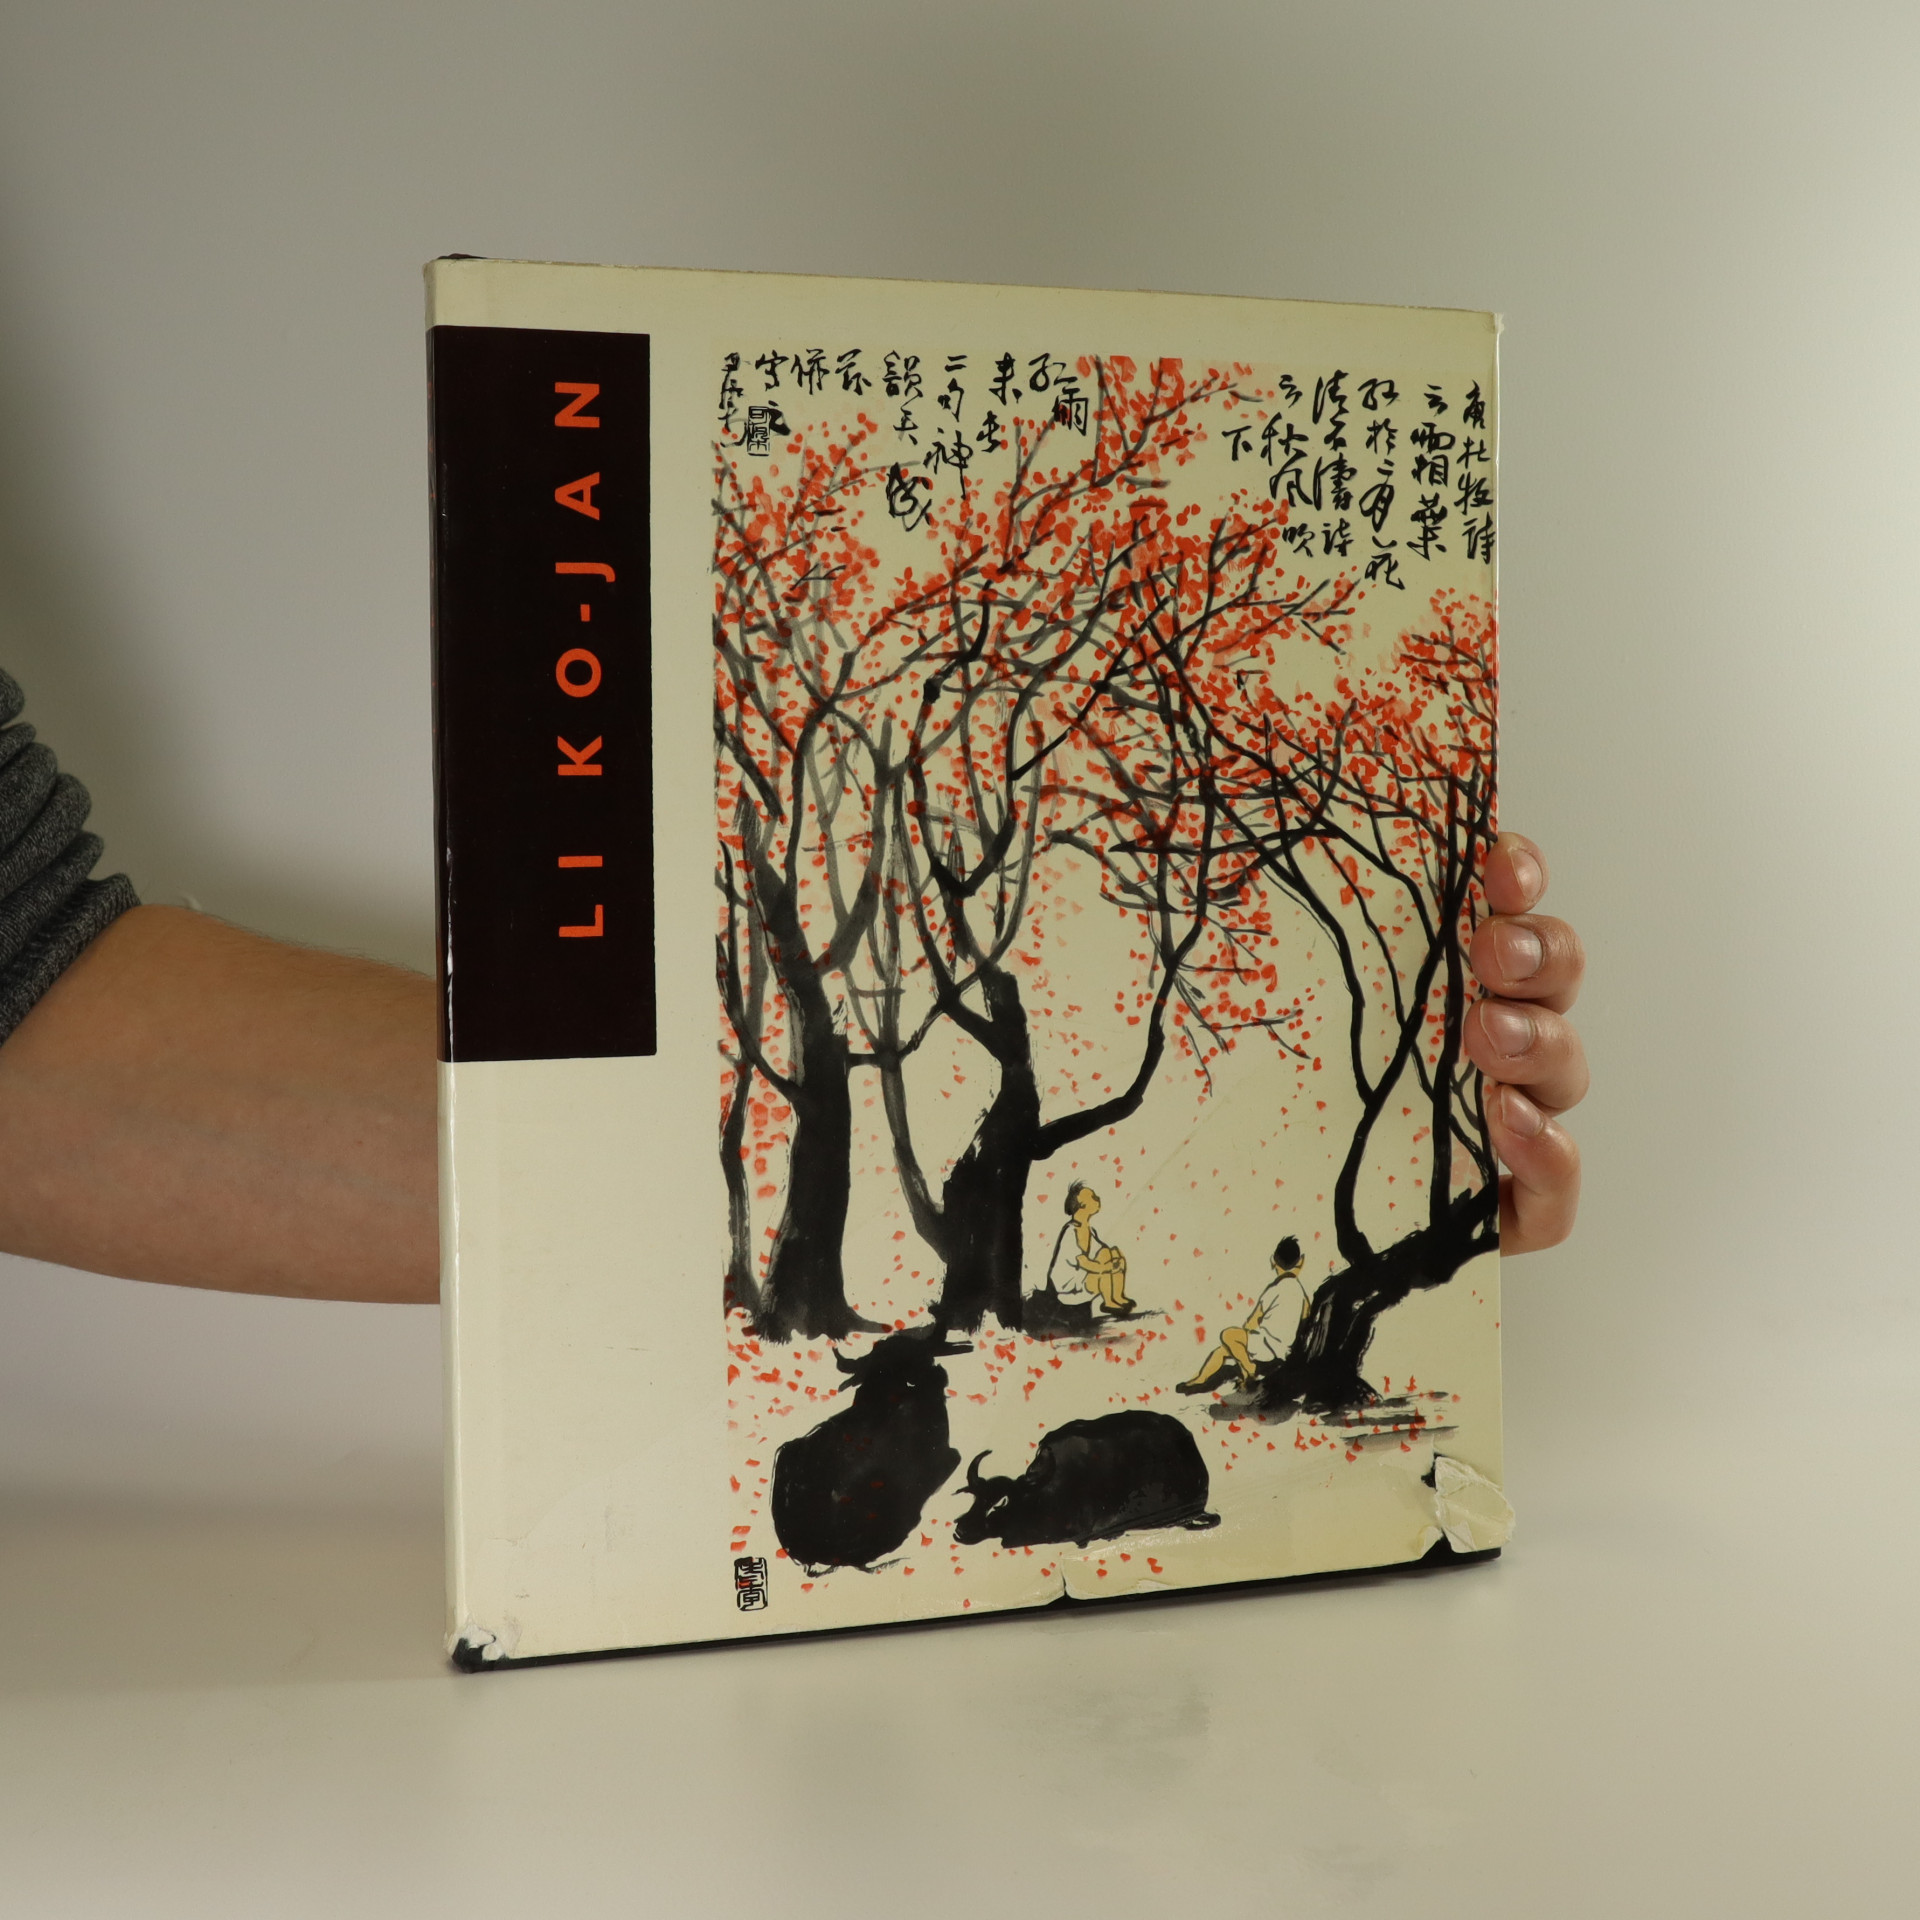 antikvární kniha Li Ko-jan, 1963